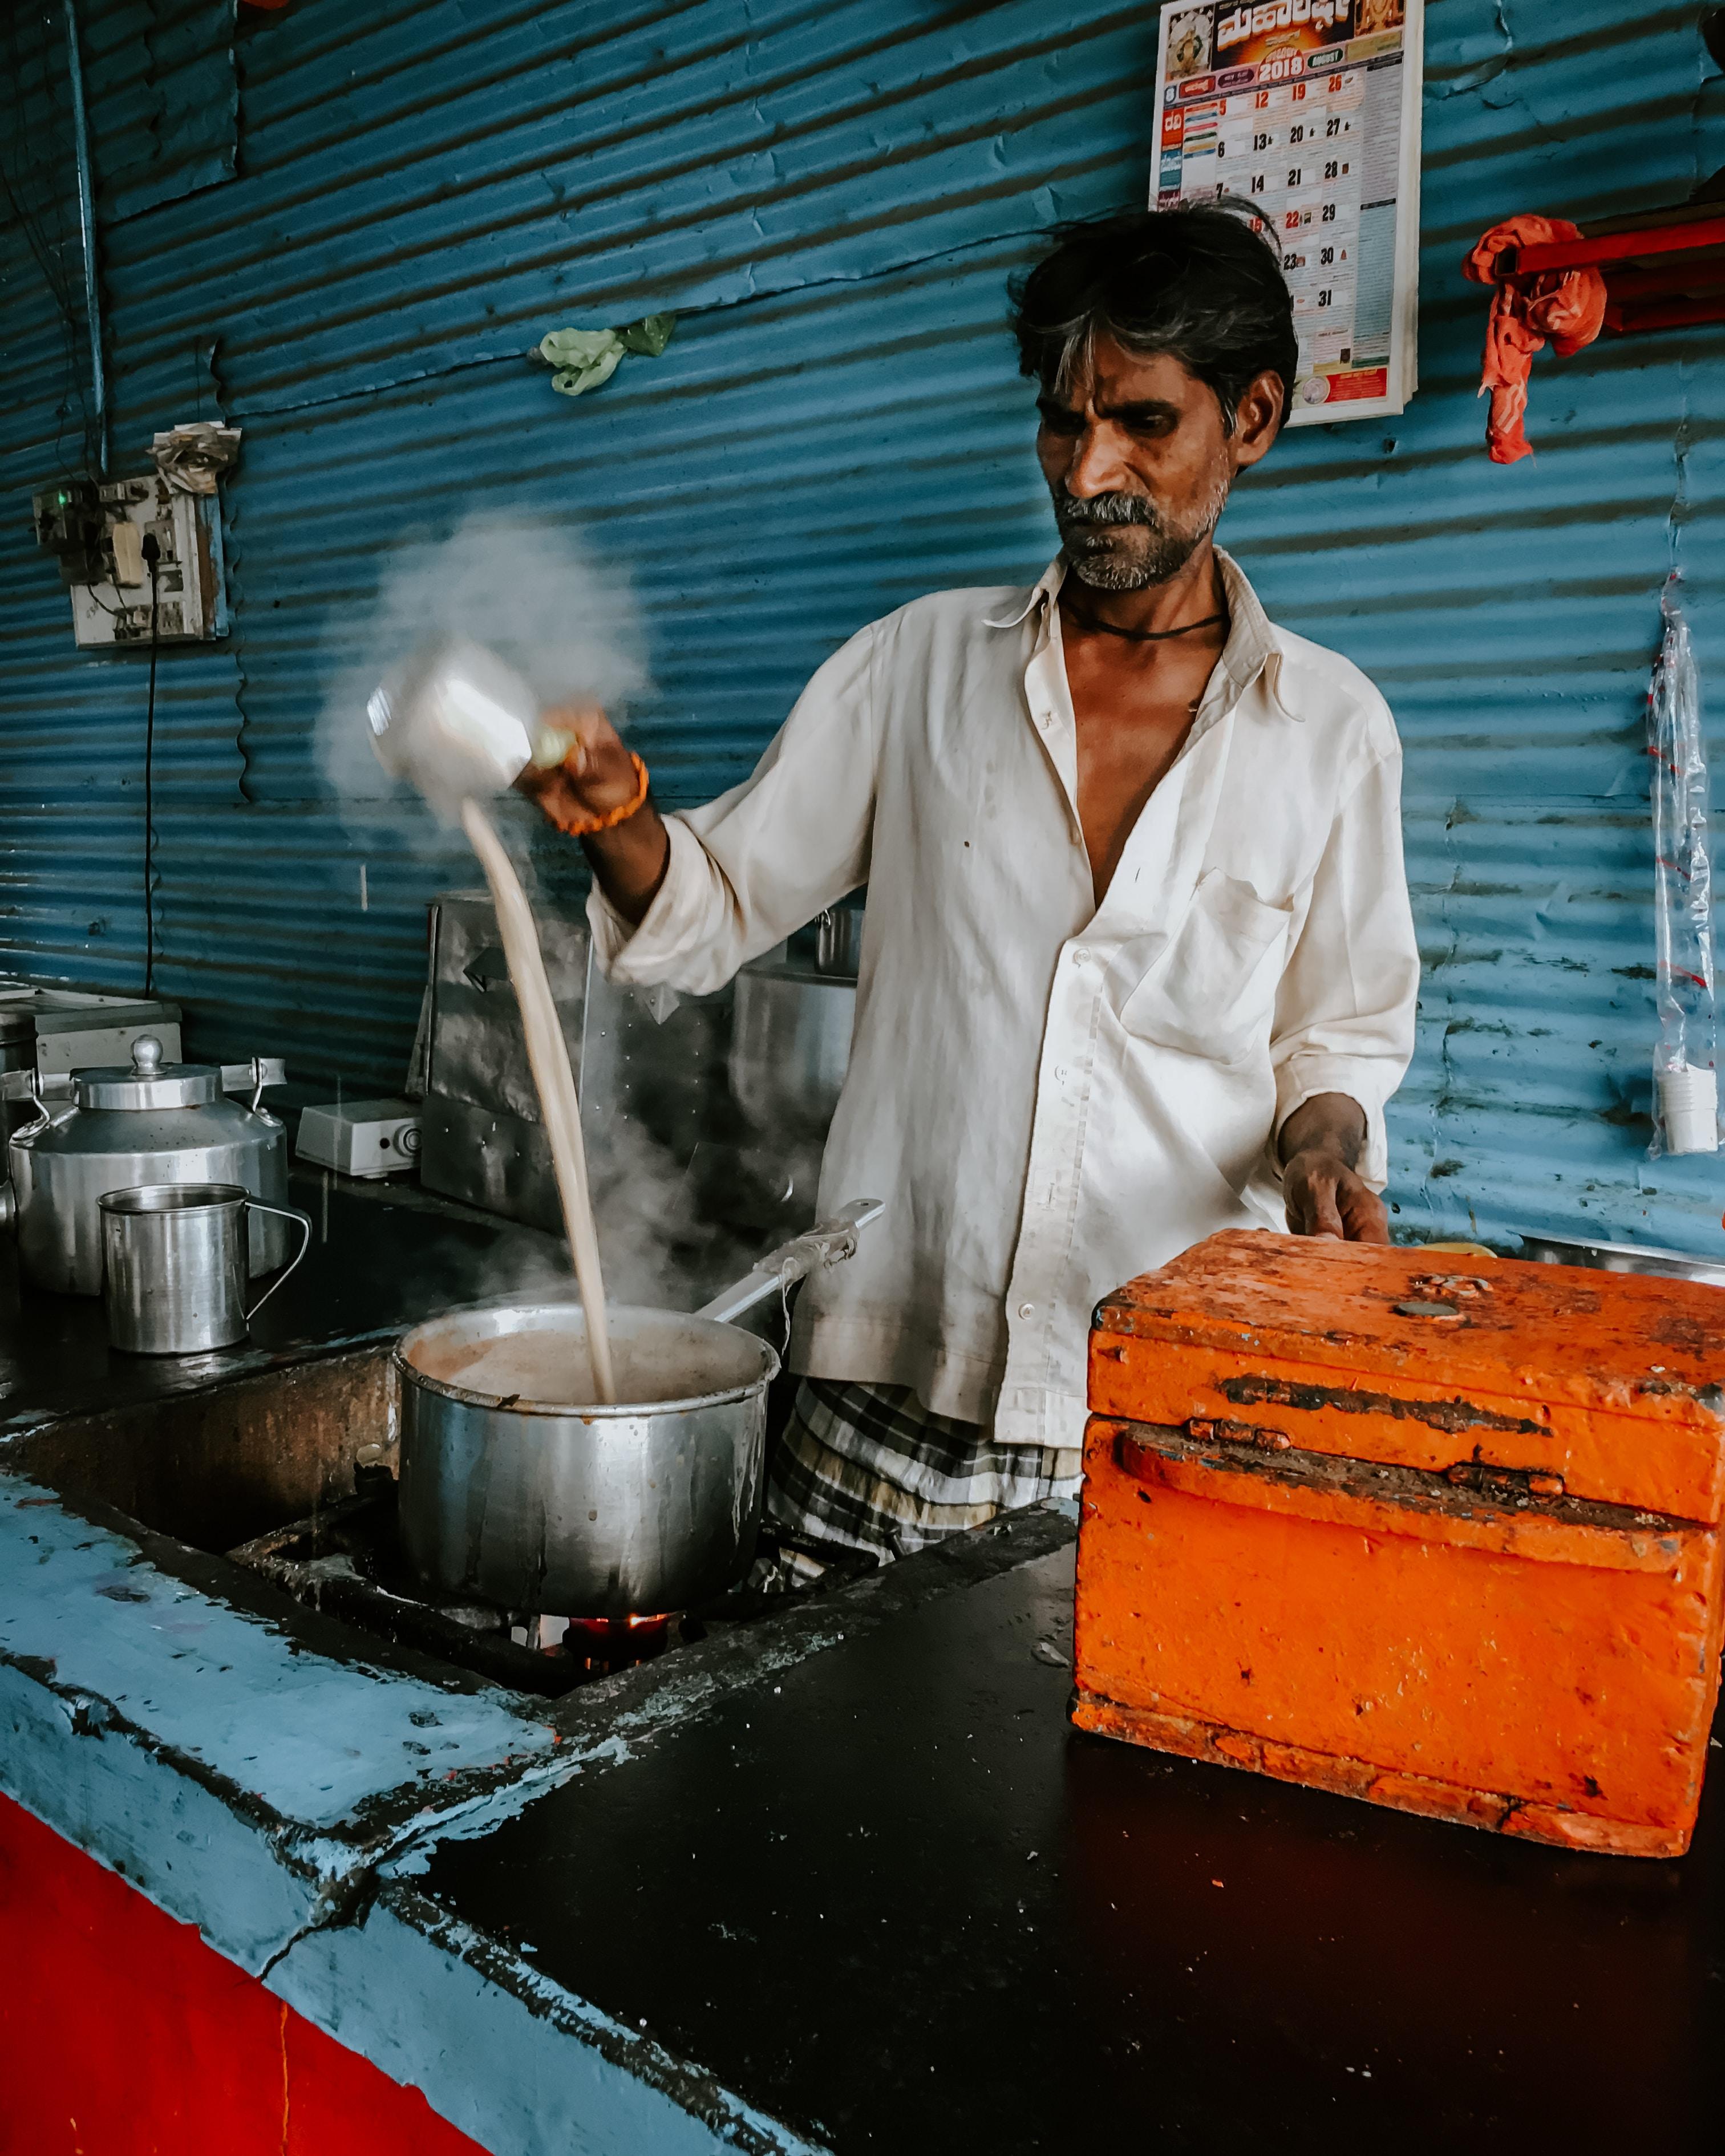 man pouring sauce on pot